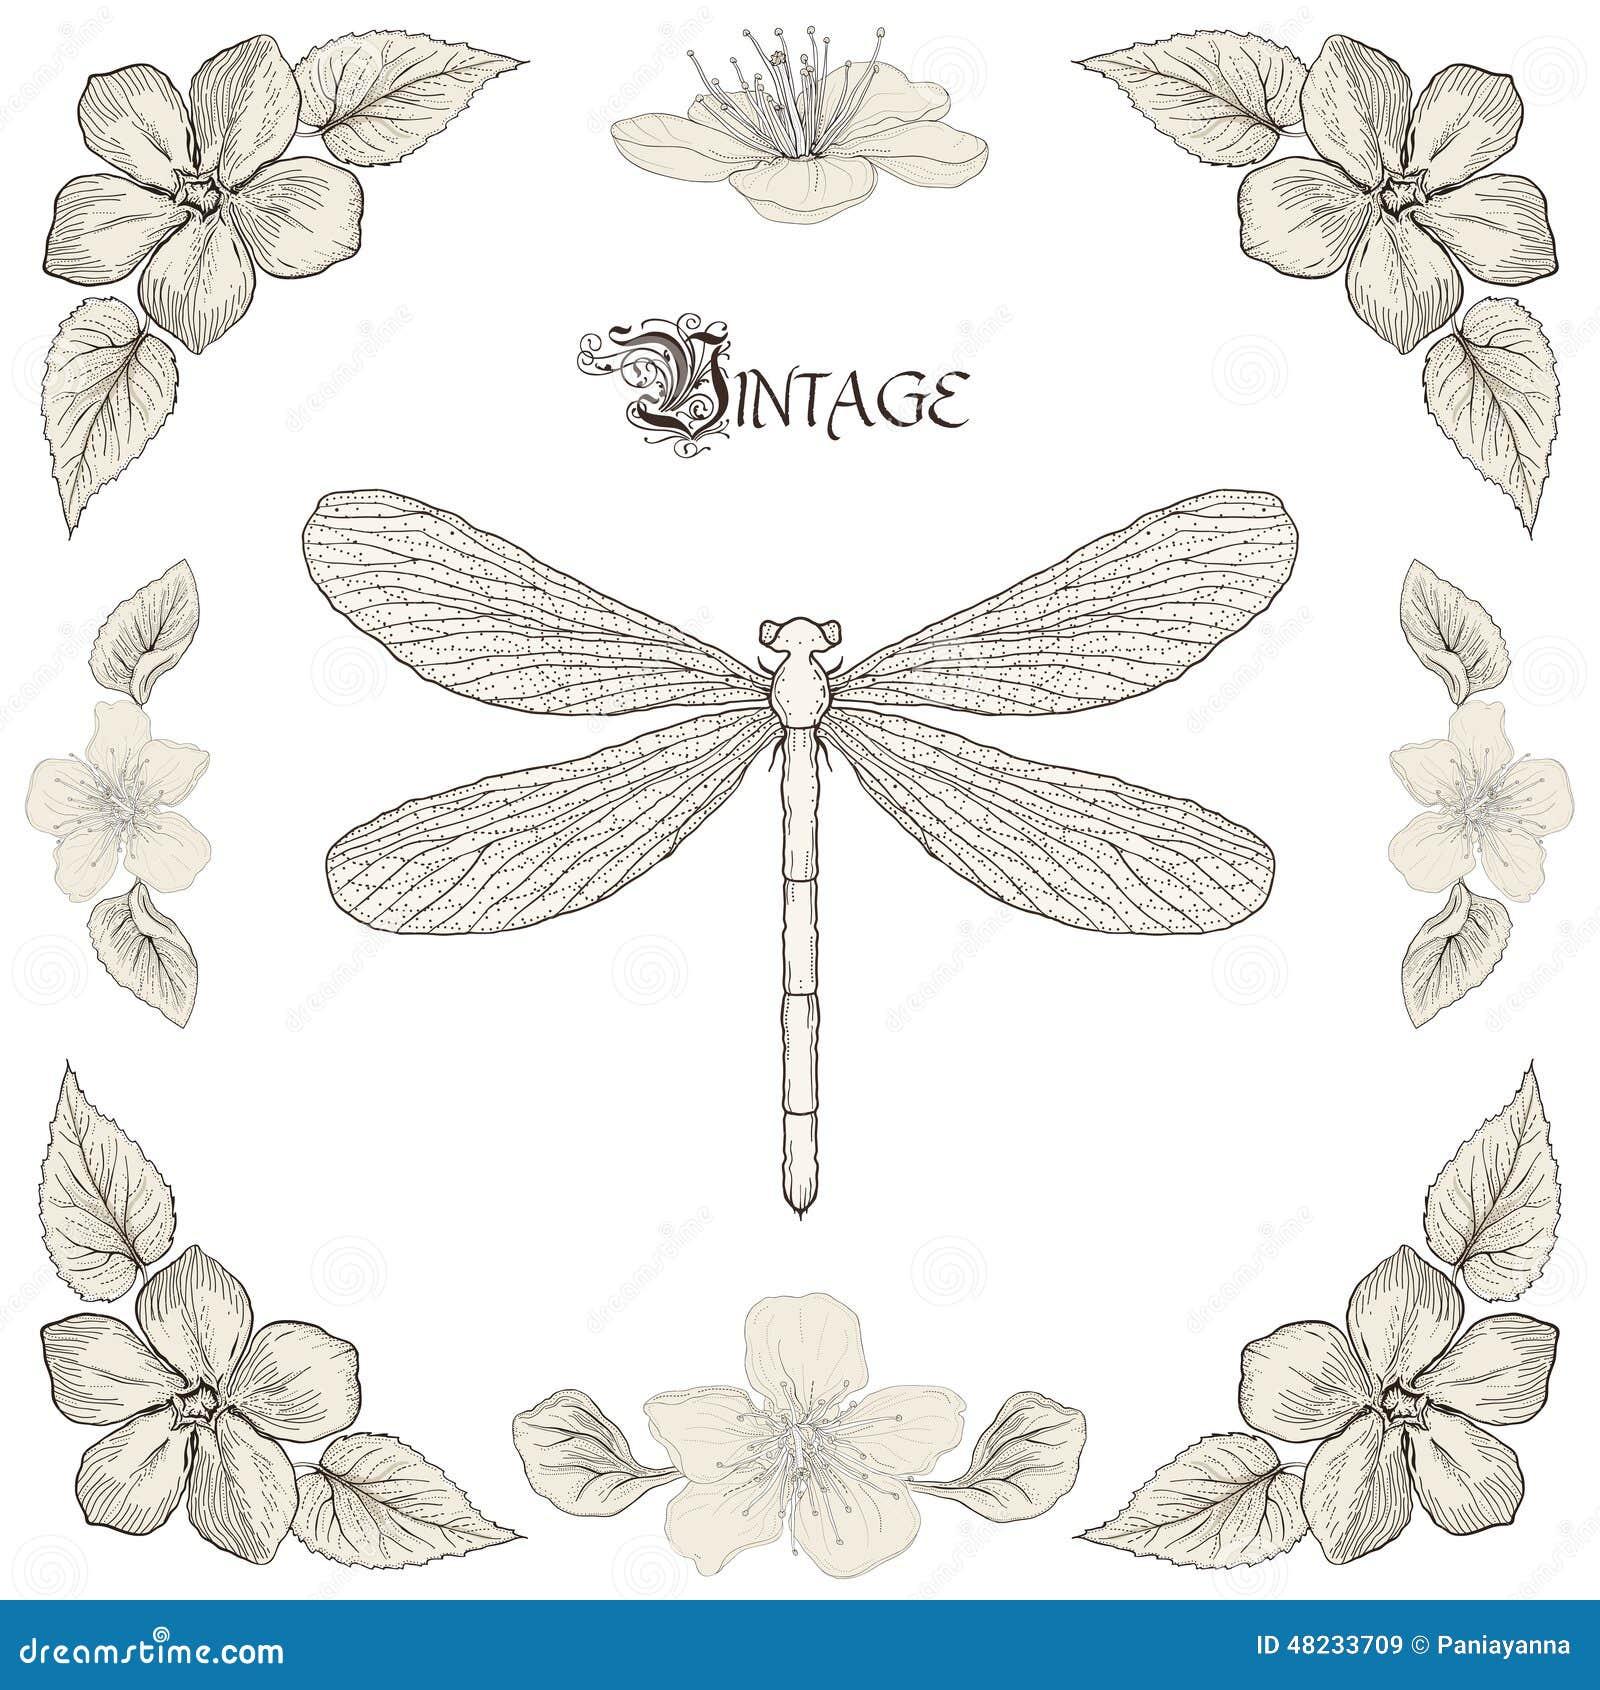 Style de gravure de vintage de dessin de libellule - Libellule dessin ...